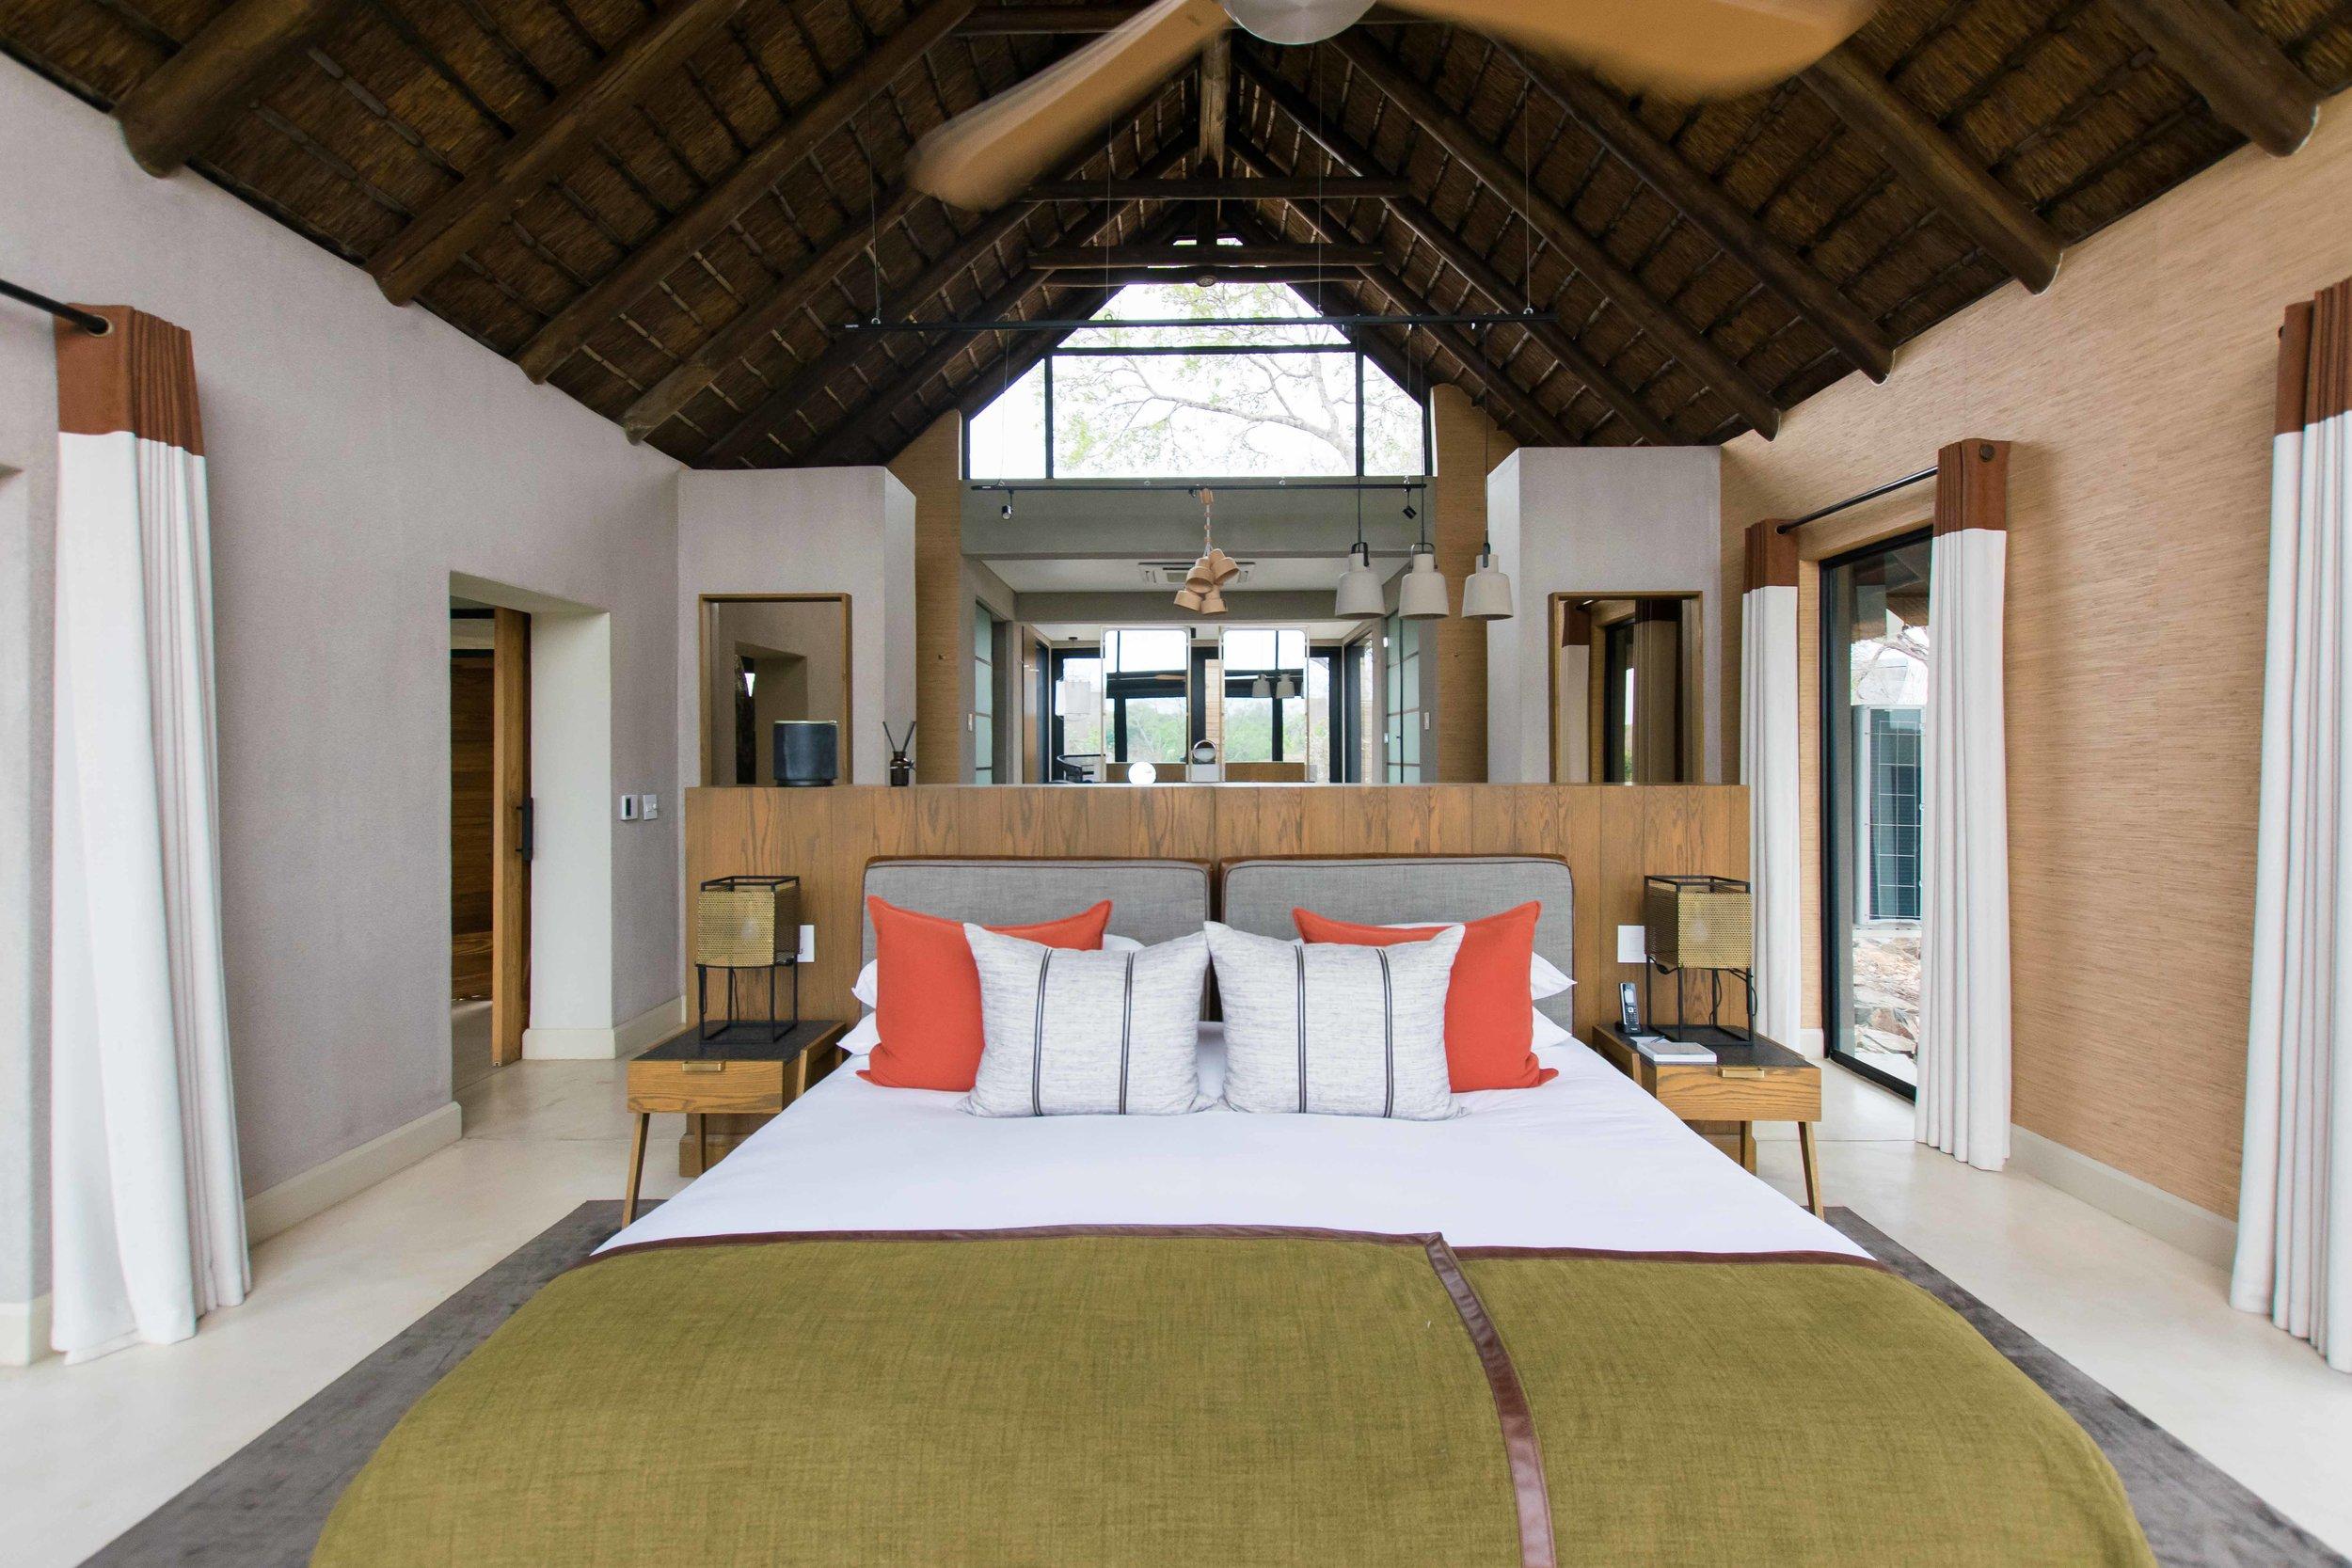 Bedrooms at Lion Sands Ivory Lodge